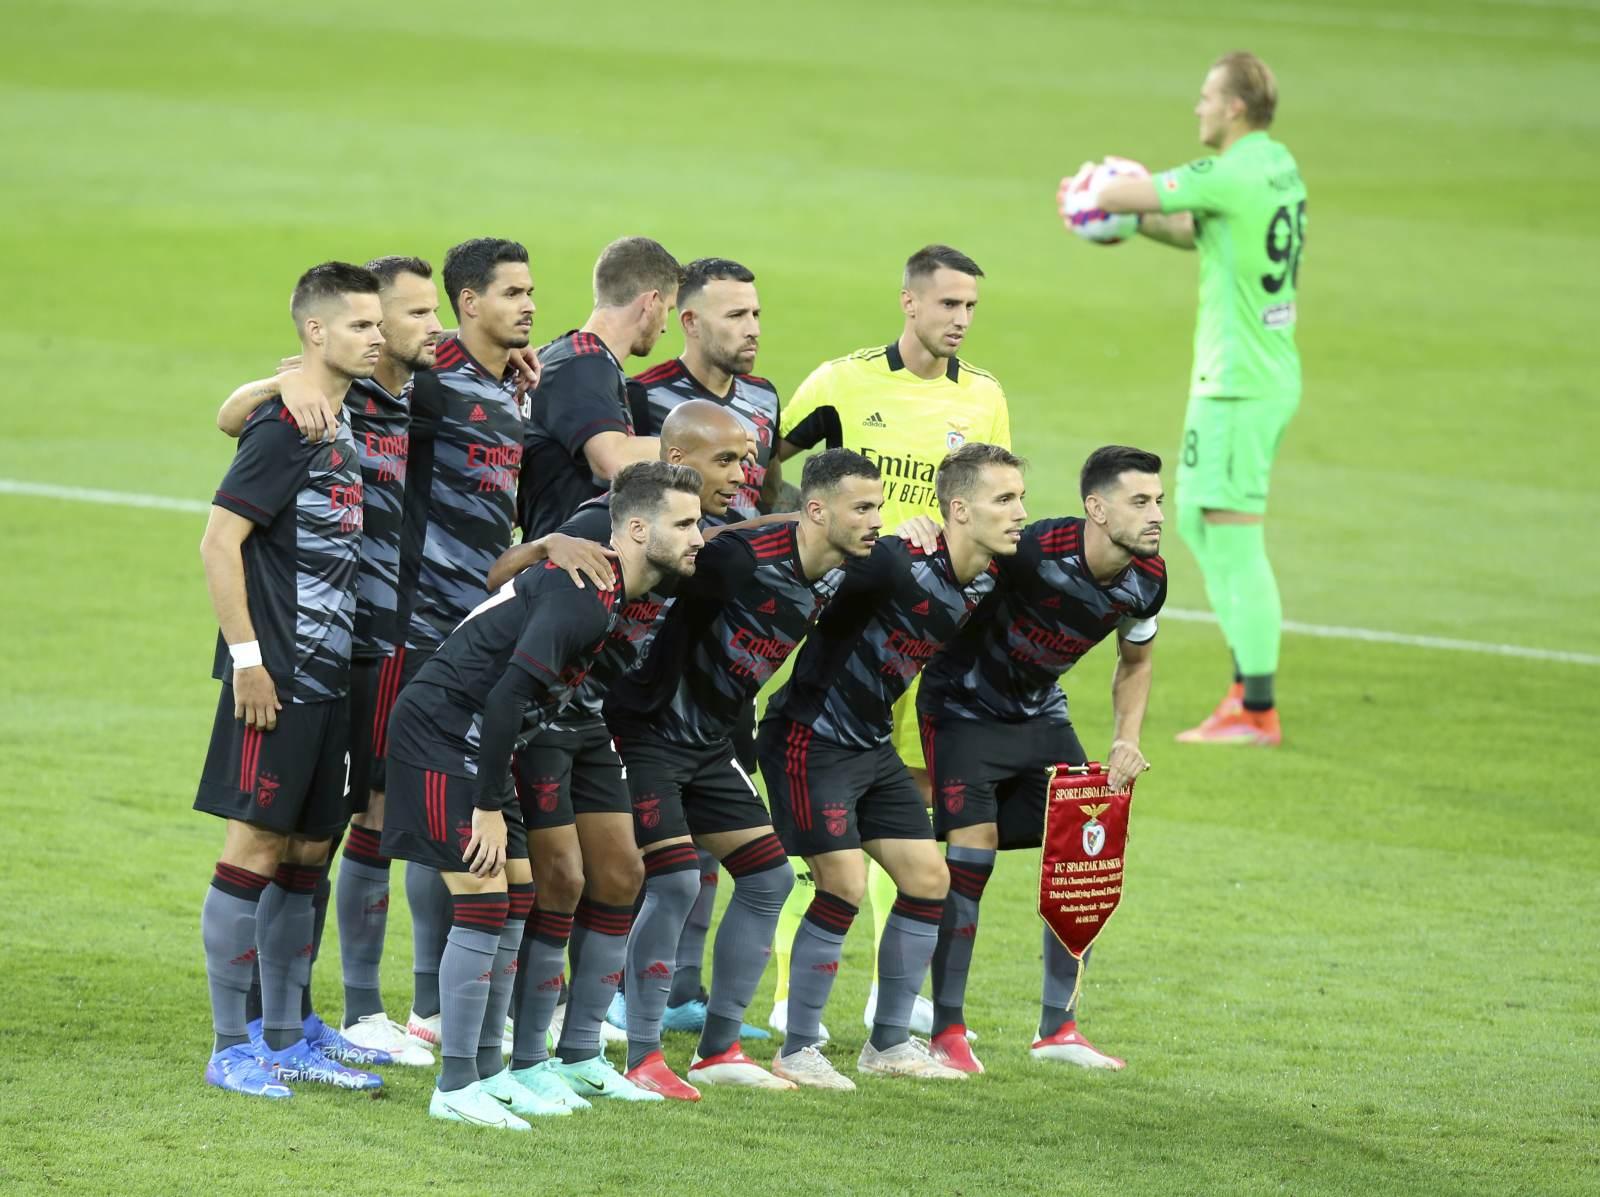 «Динамо» Киев – «Бенфика» - 0:0 (завершён)